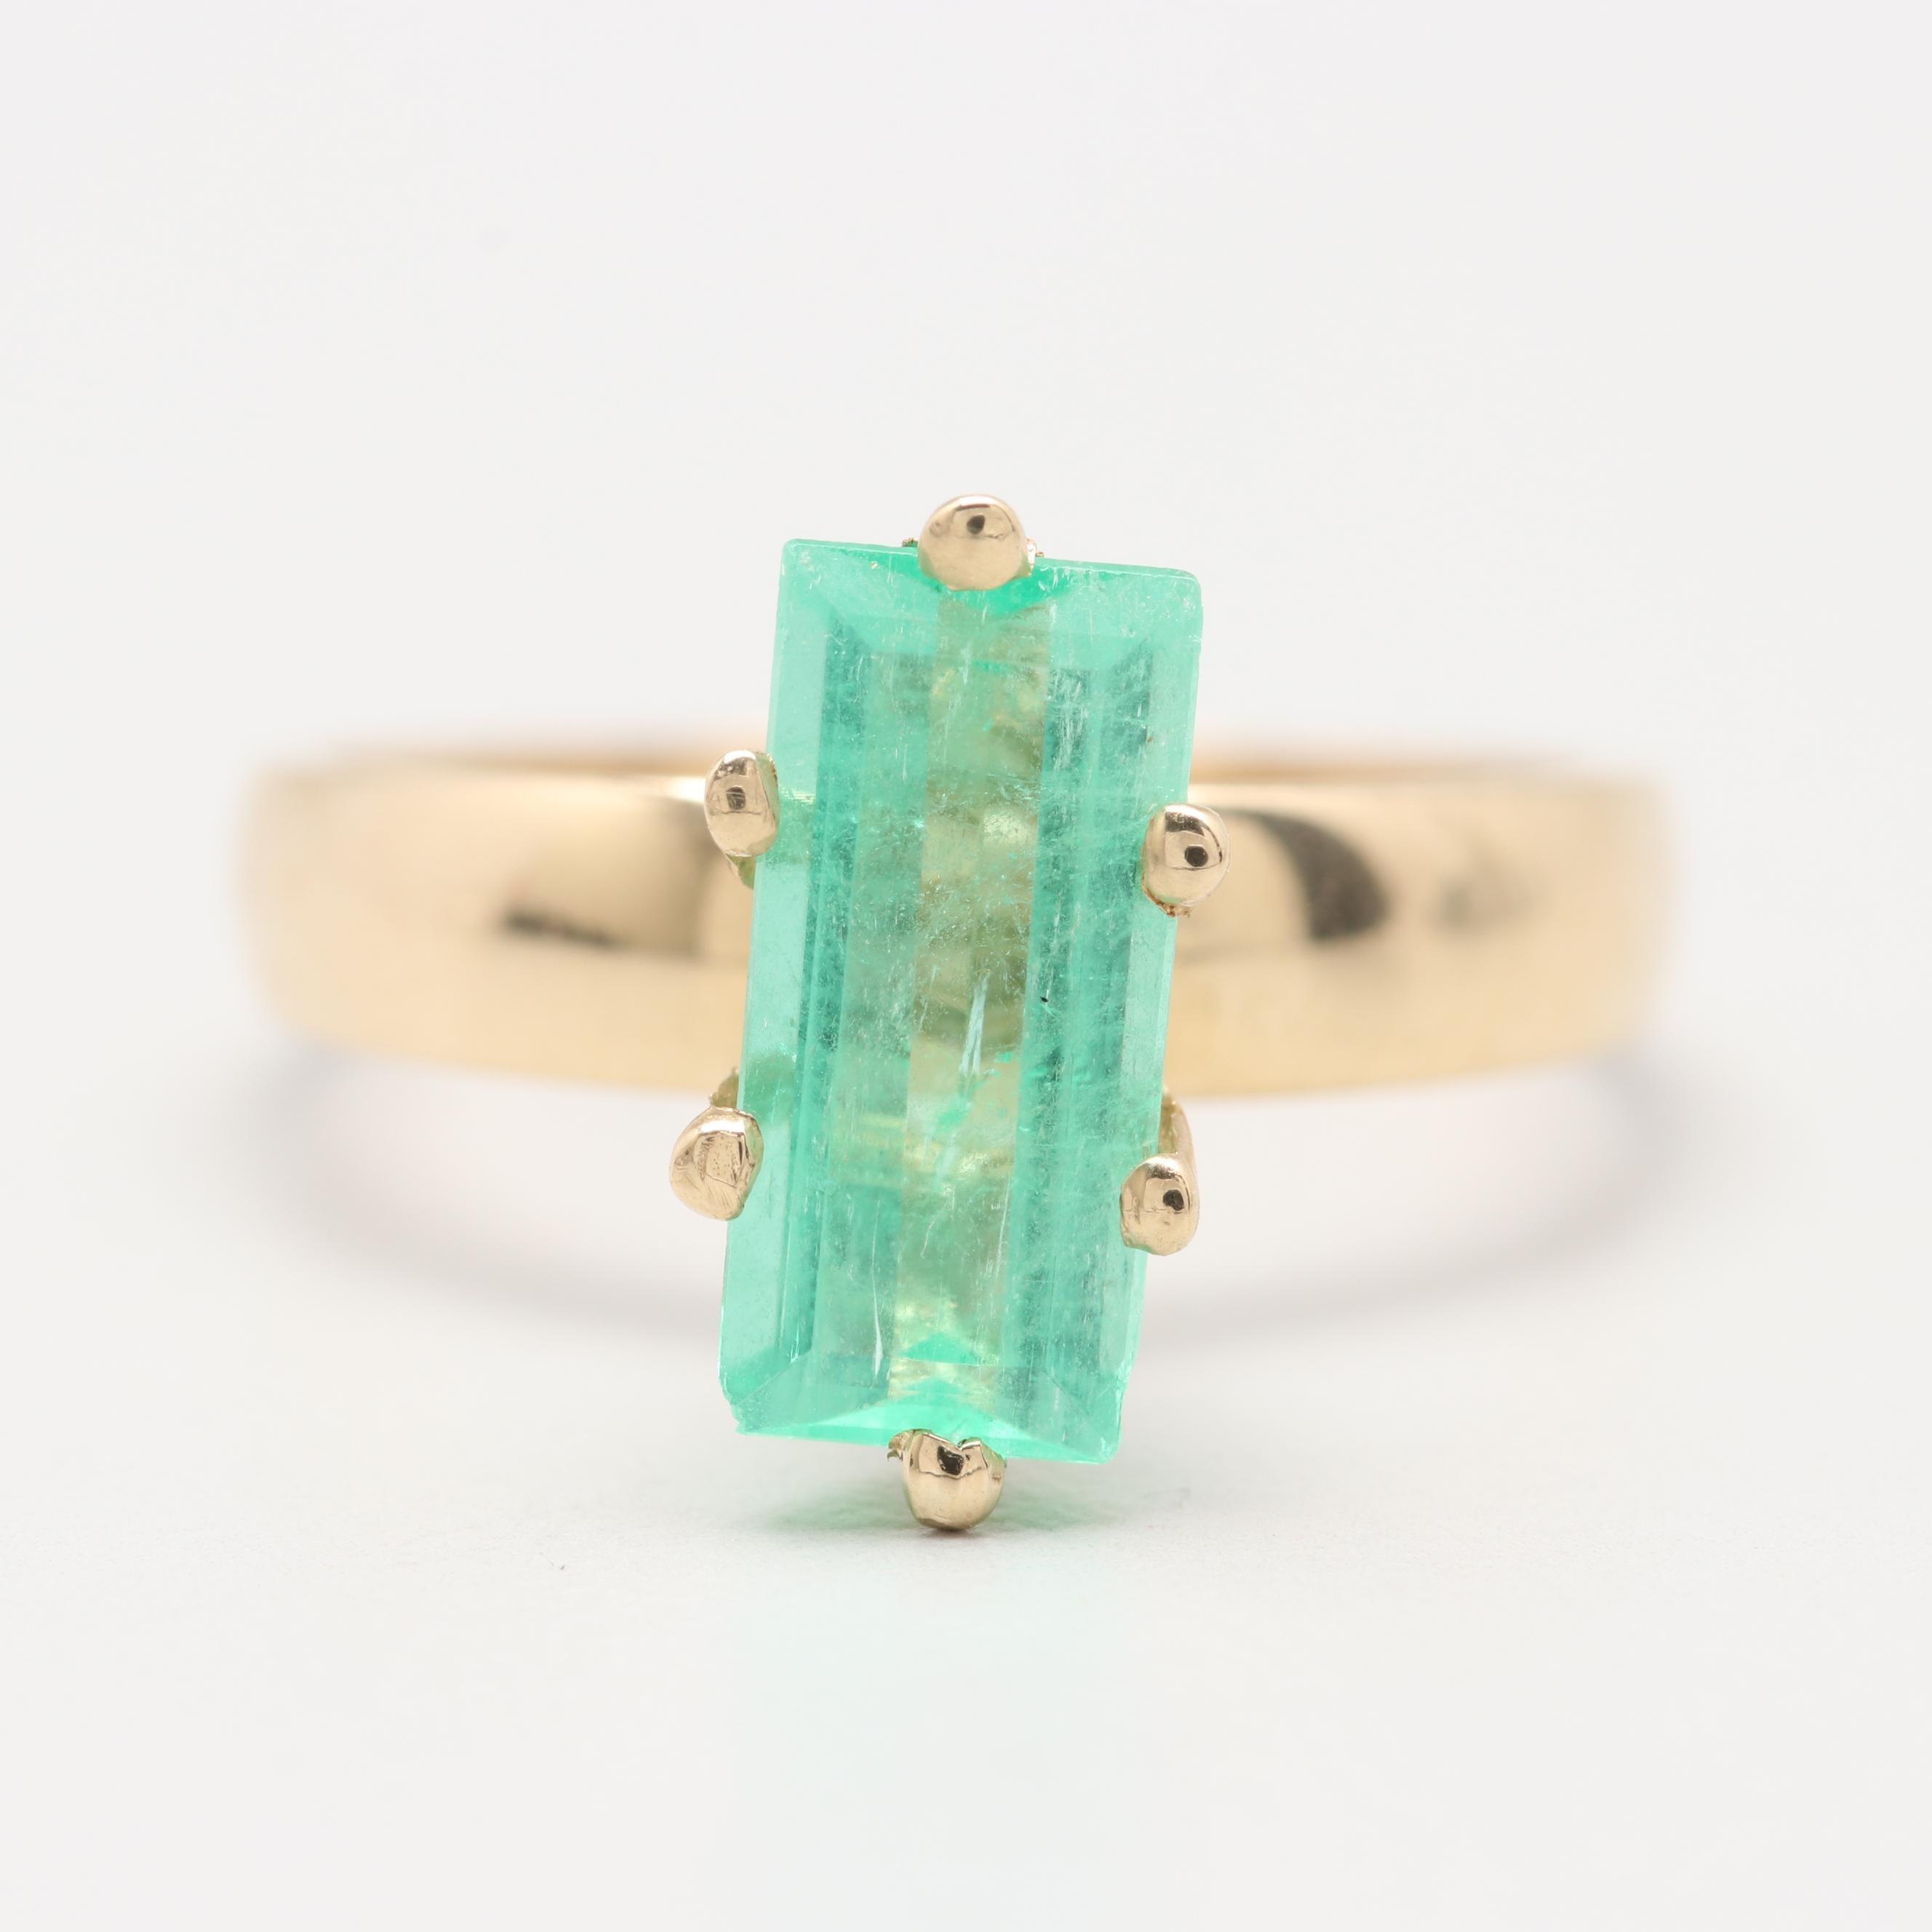 14K Yellow Gold 1.18 CT Emerald Ring